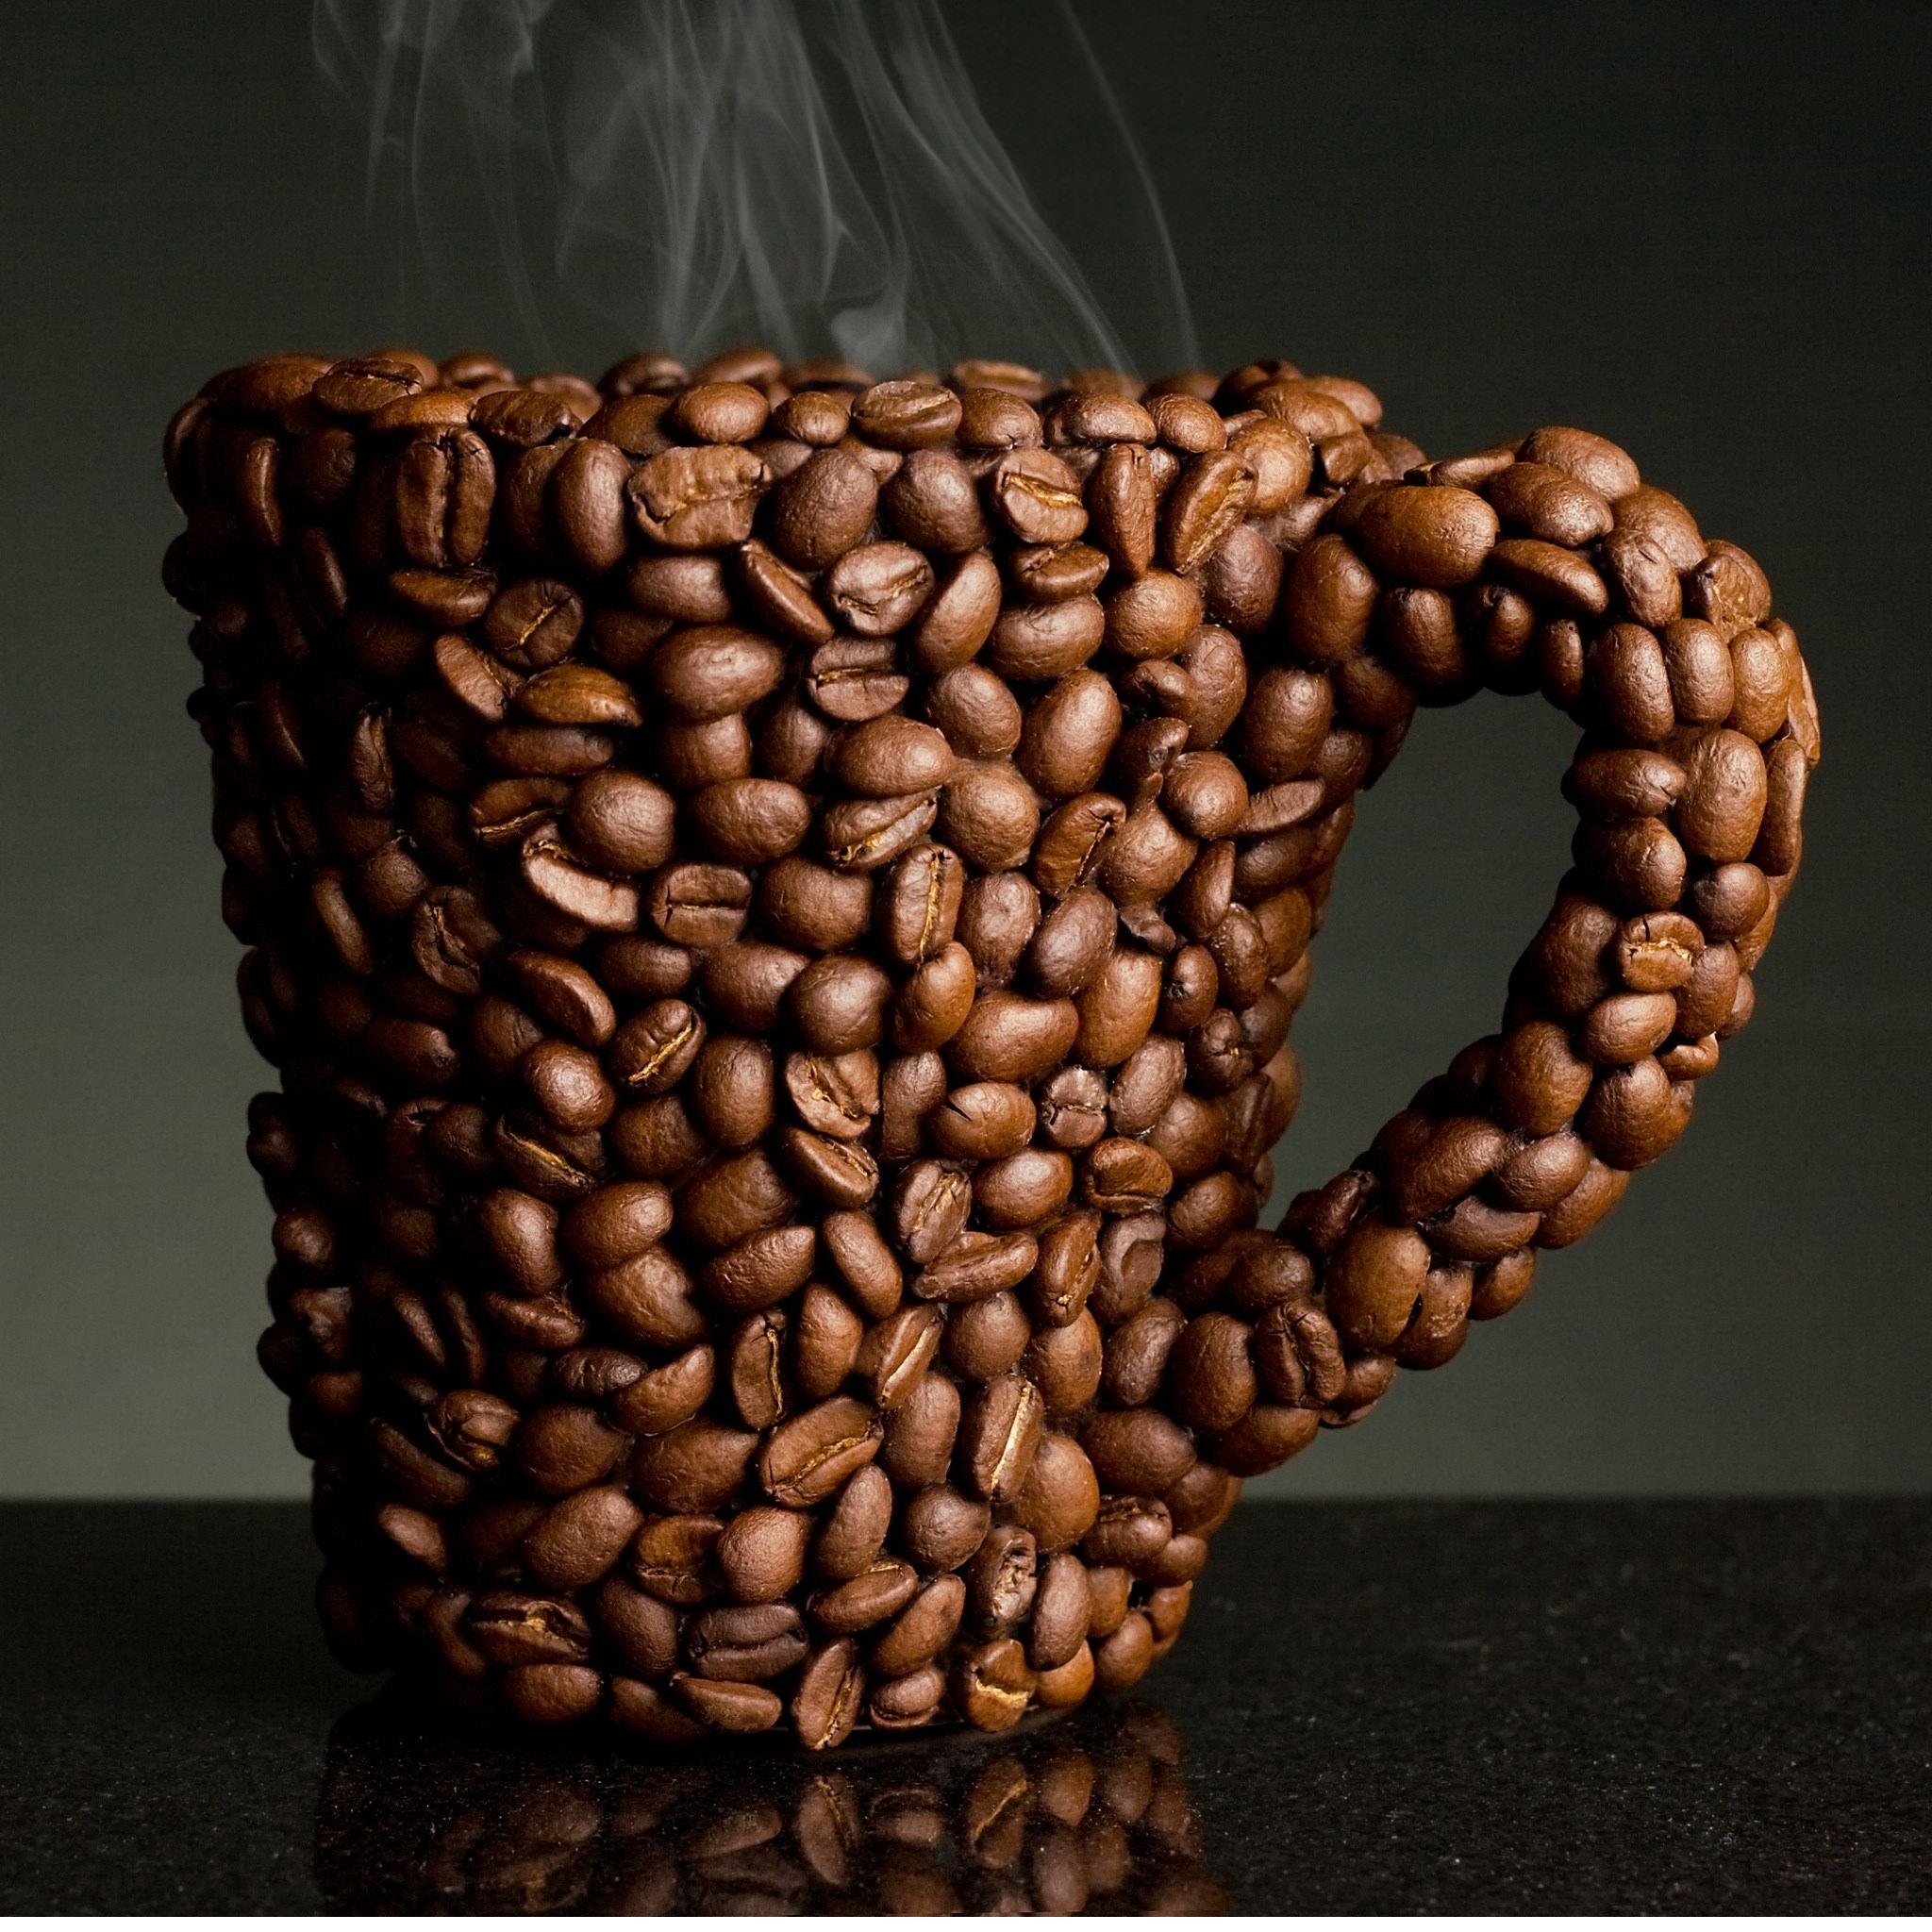 coffee bean cup wallpaper